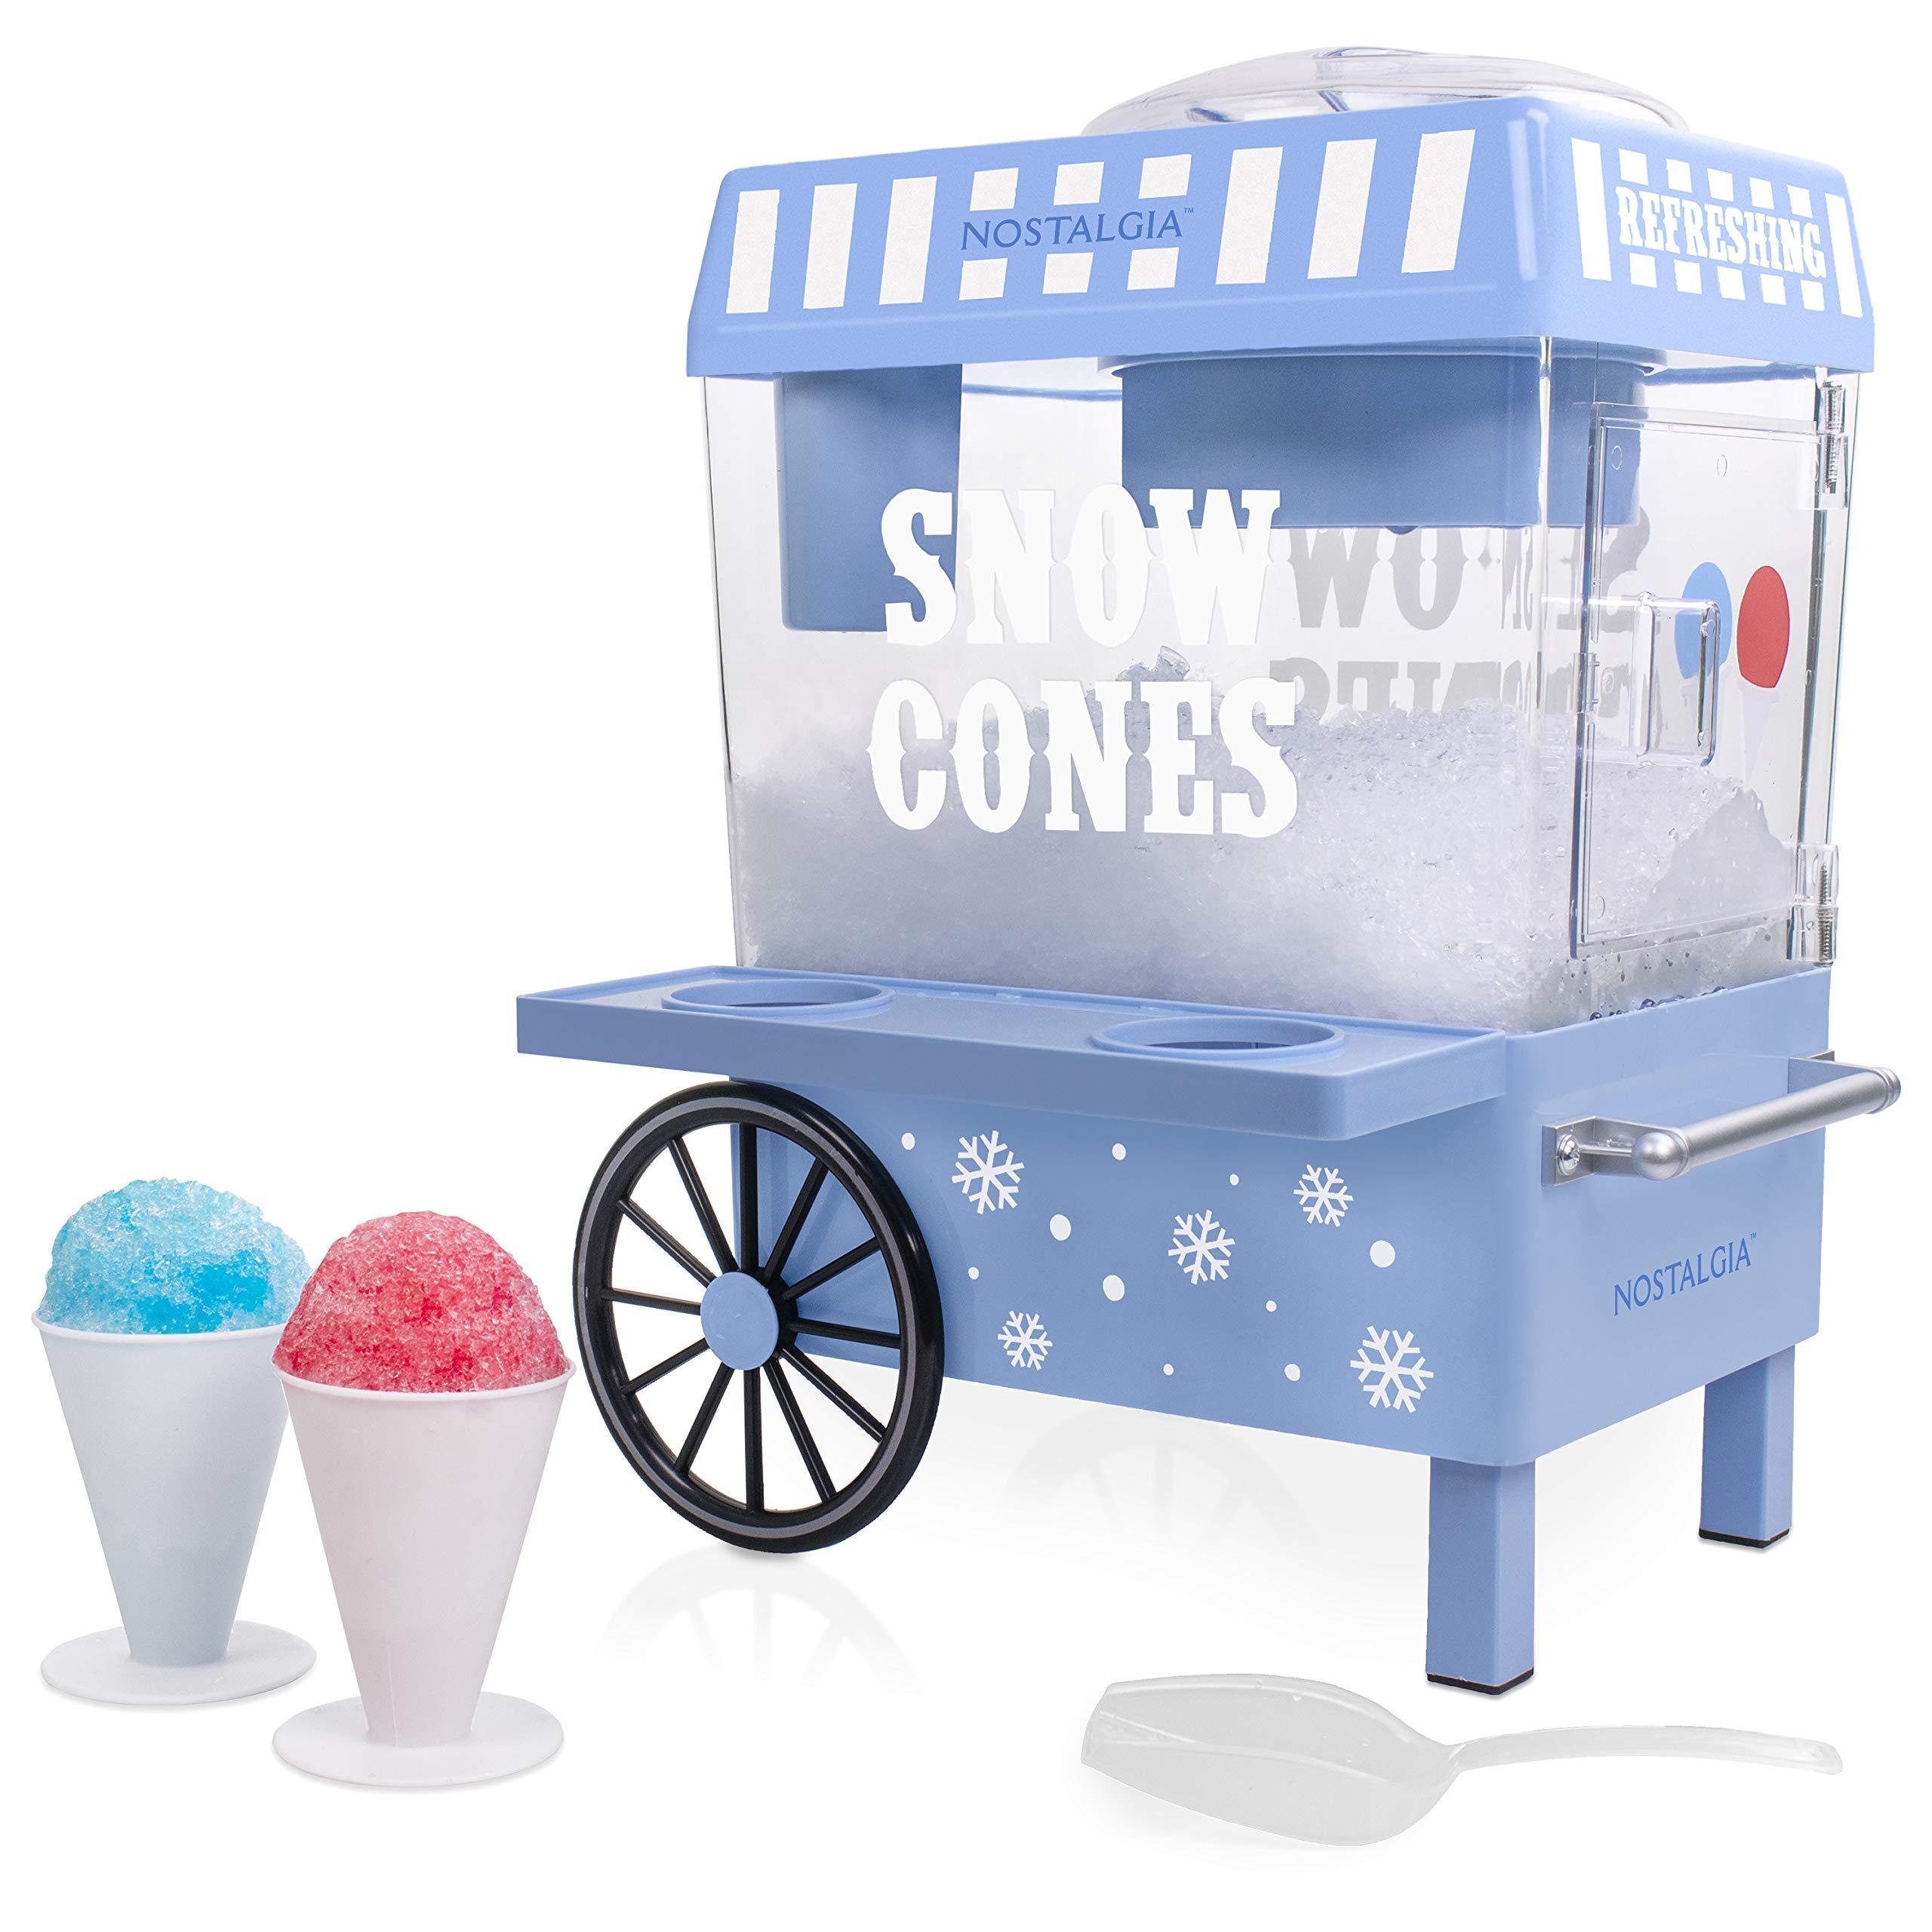 Nostalgia SCM525BL Vintage Snow Cone Maker, Blue by Nostalgia